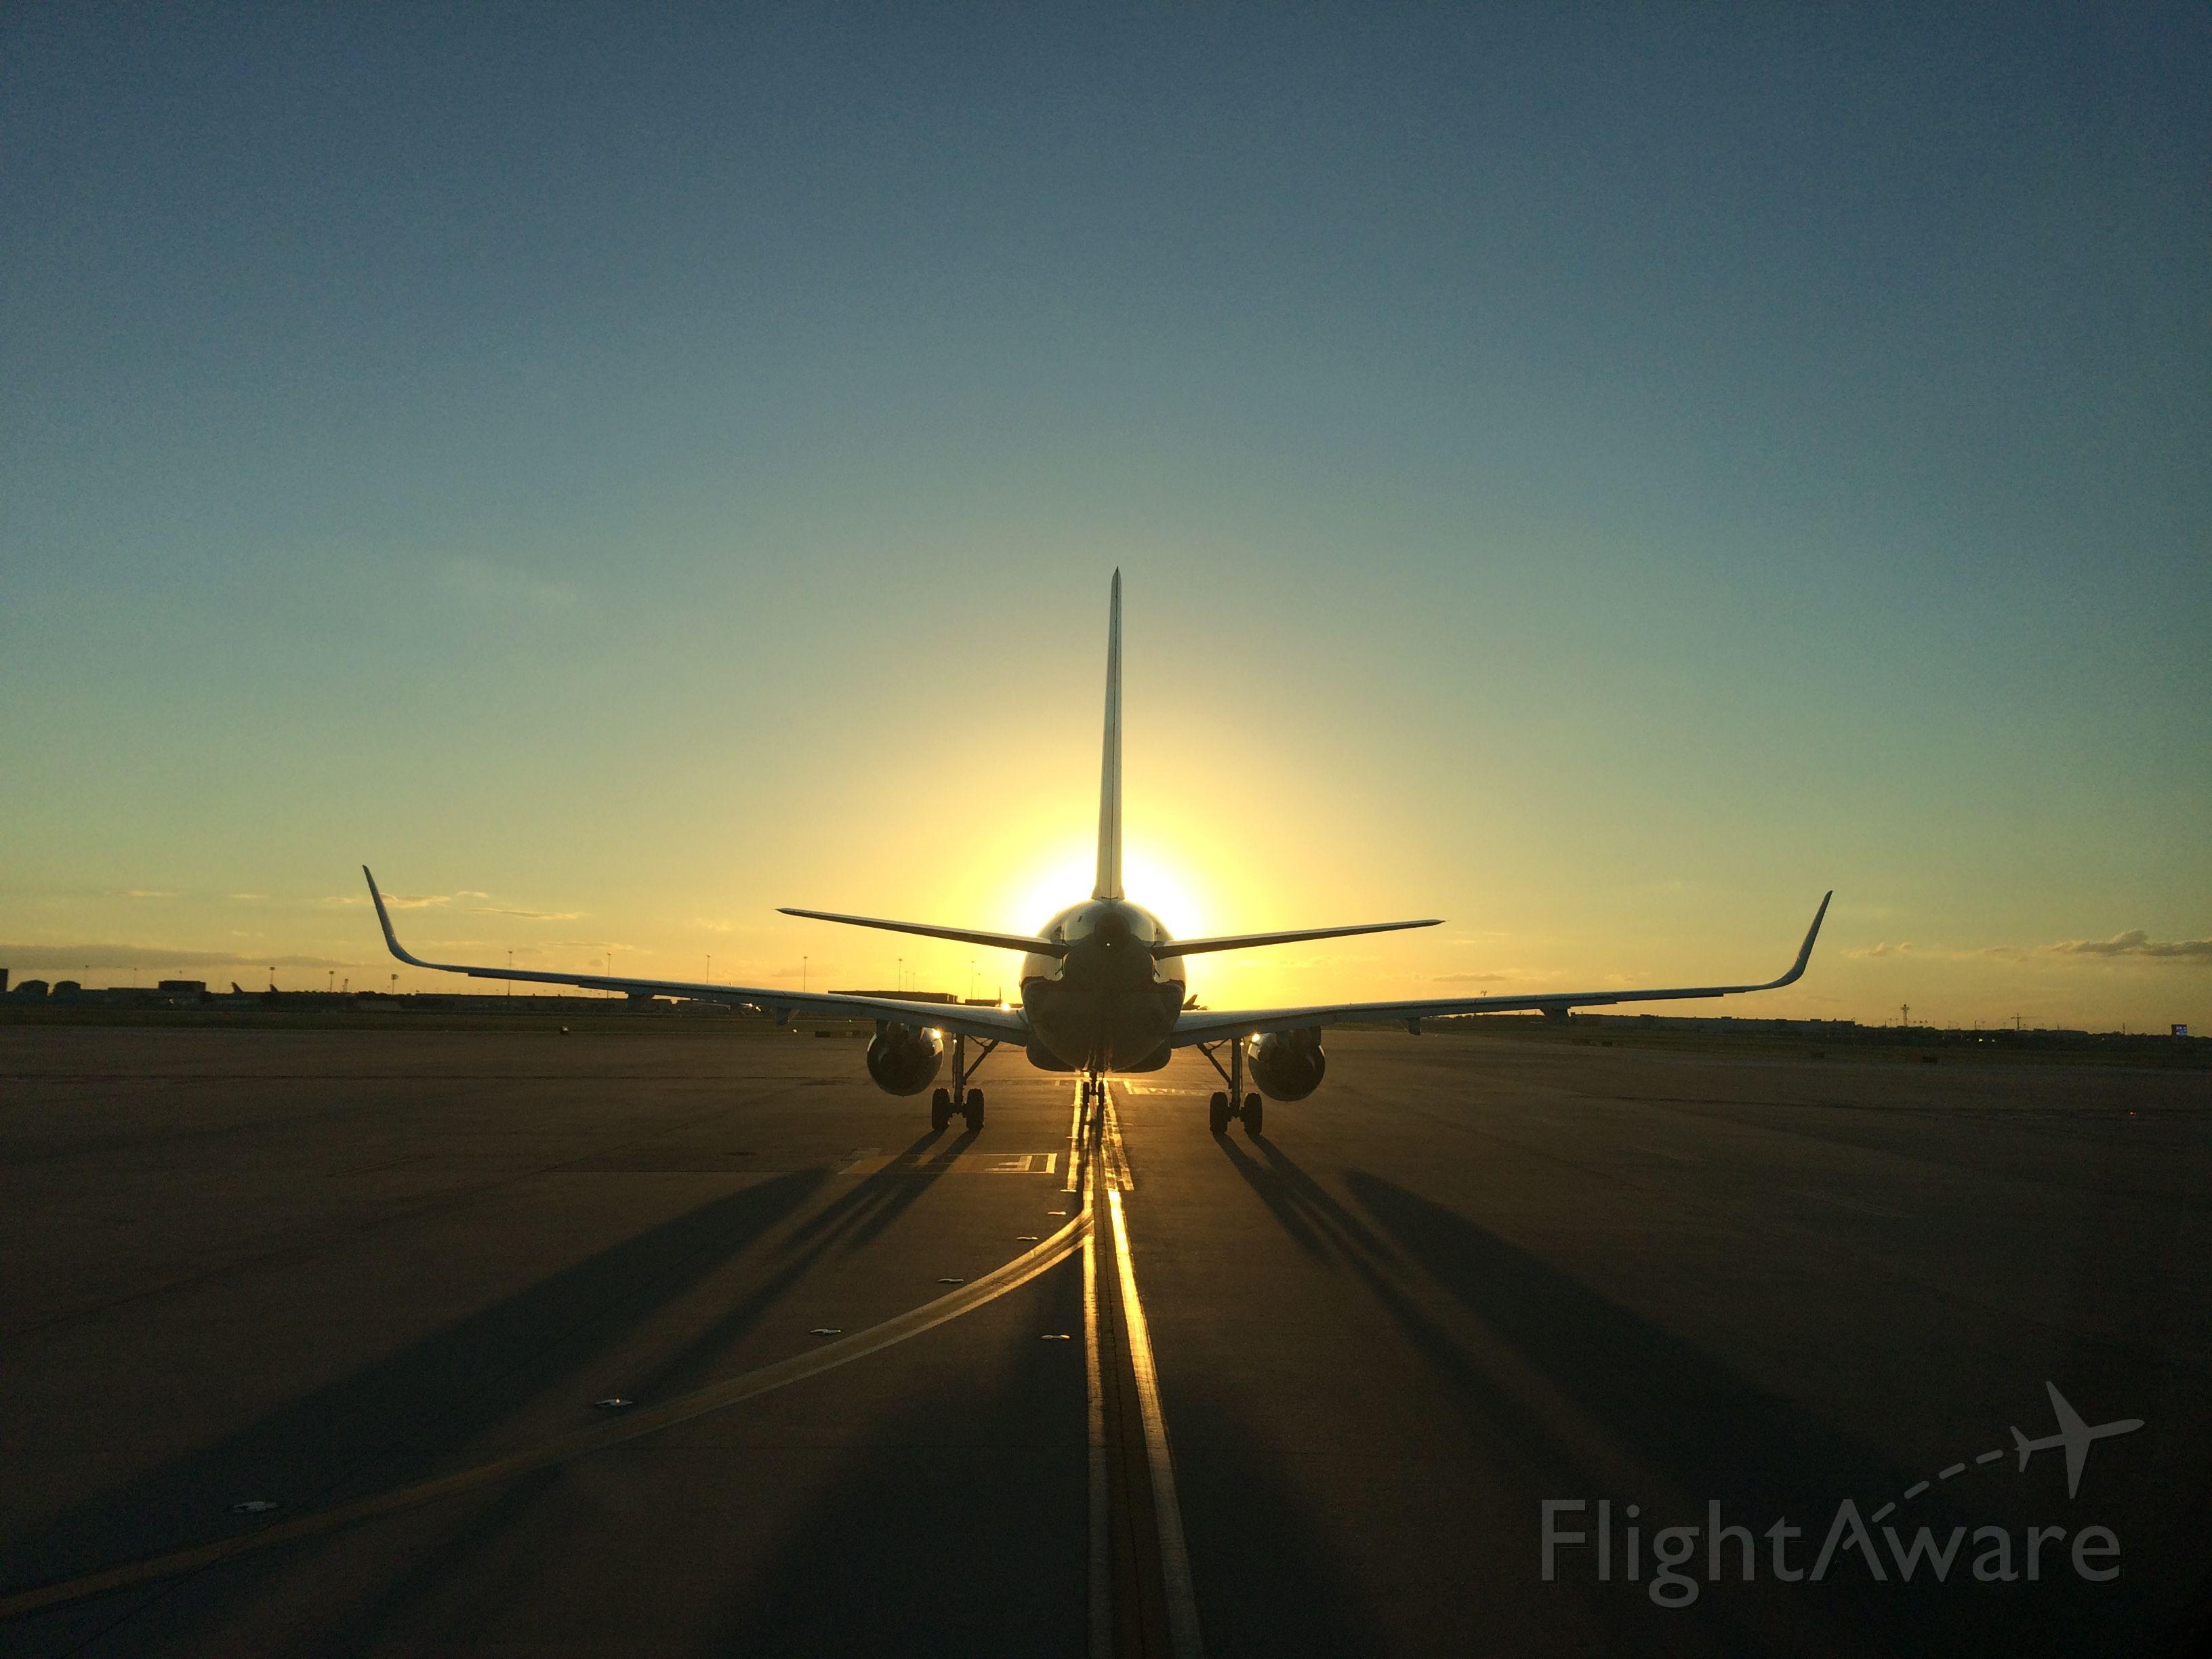 — — - #2 for sunset departure at DFW - runway 18L. September 2015. Sorry, I don